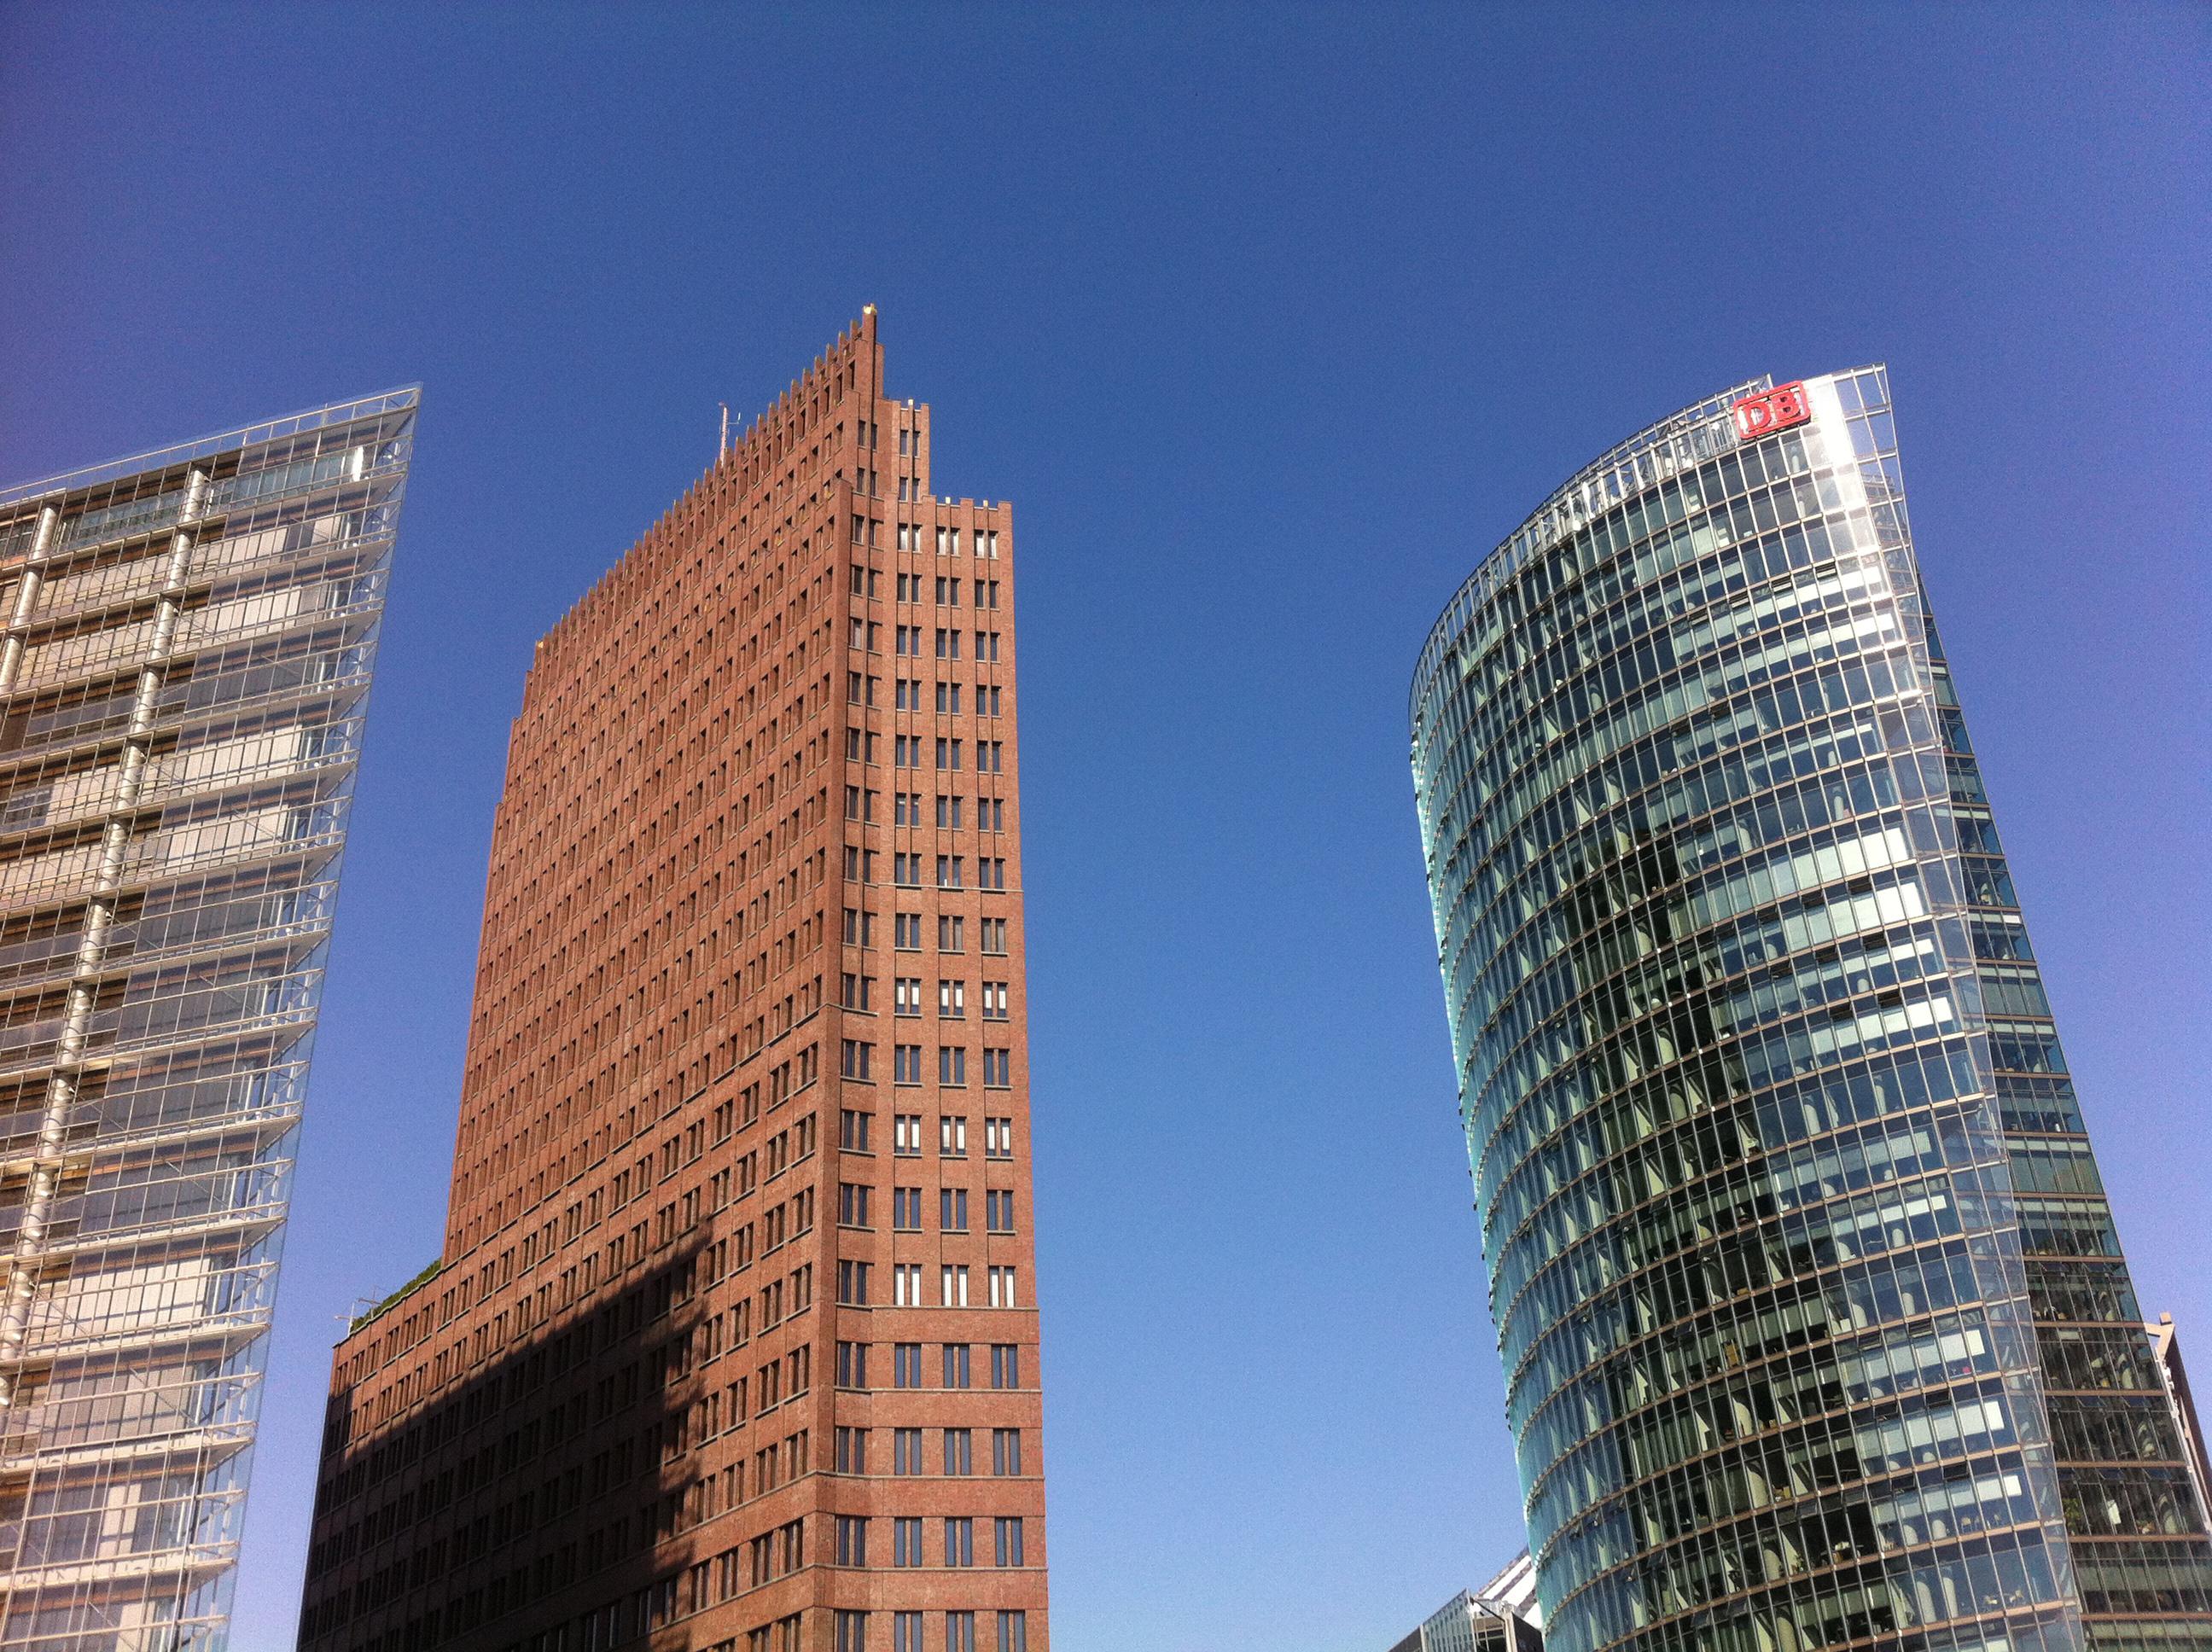 Berlin Potsdamer Platz Skyscraper Buildings